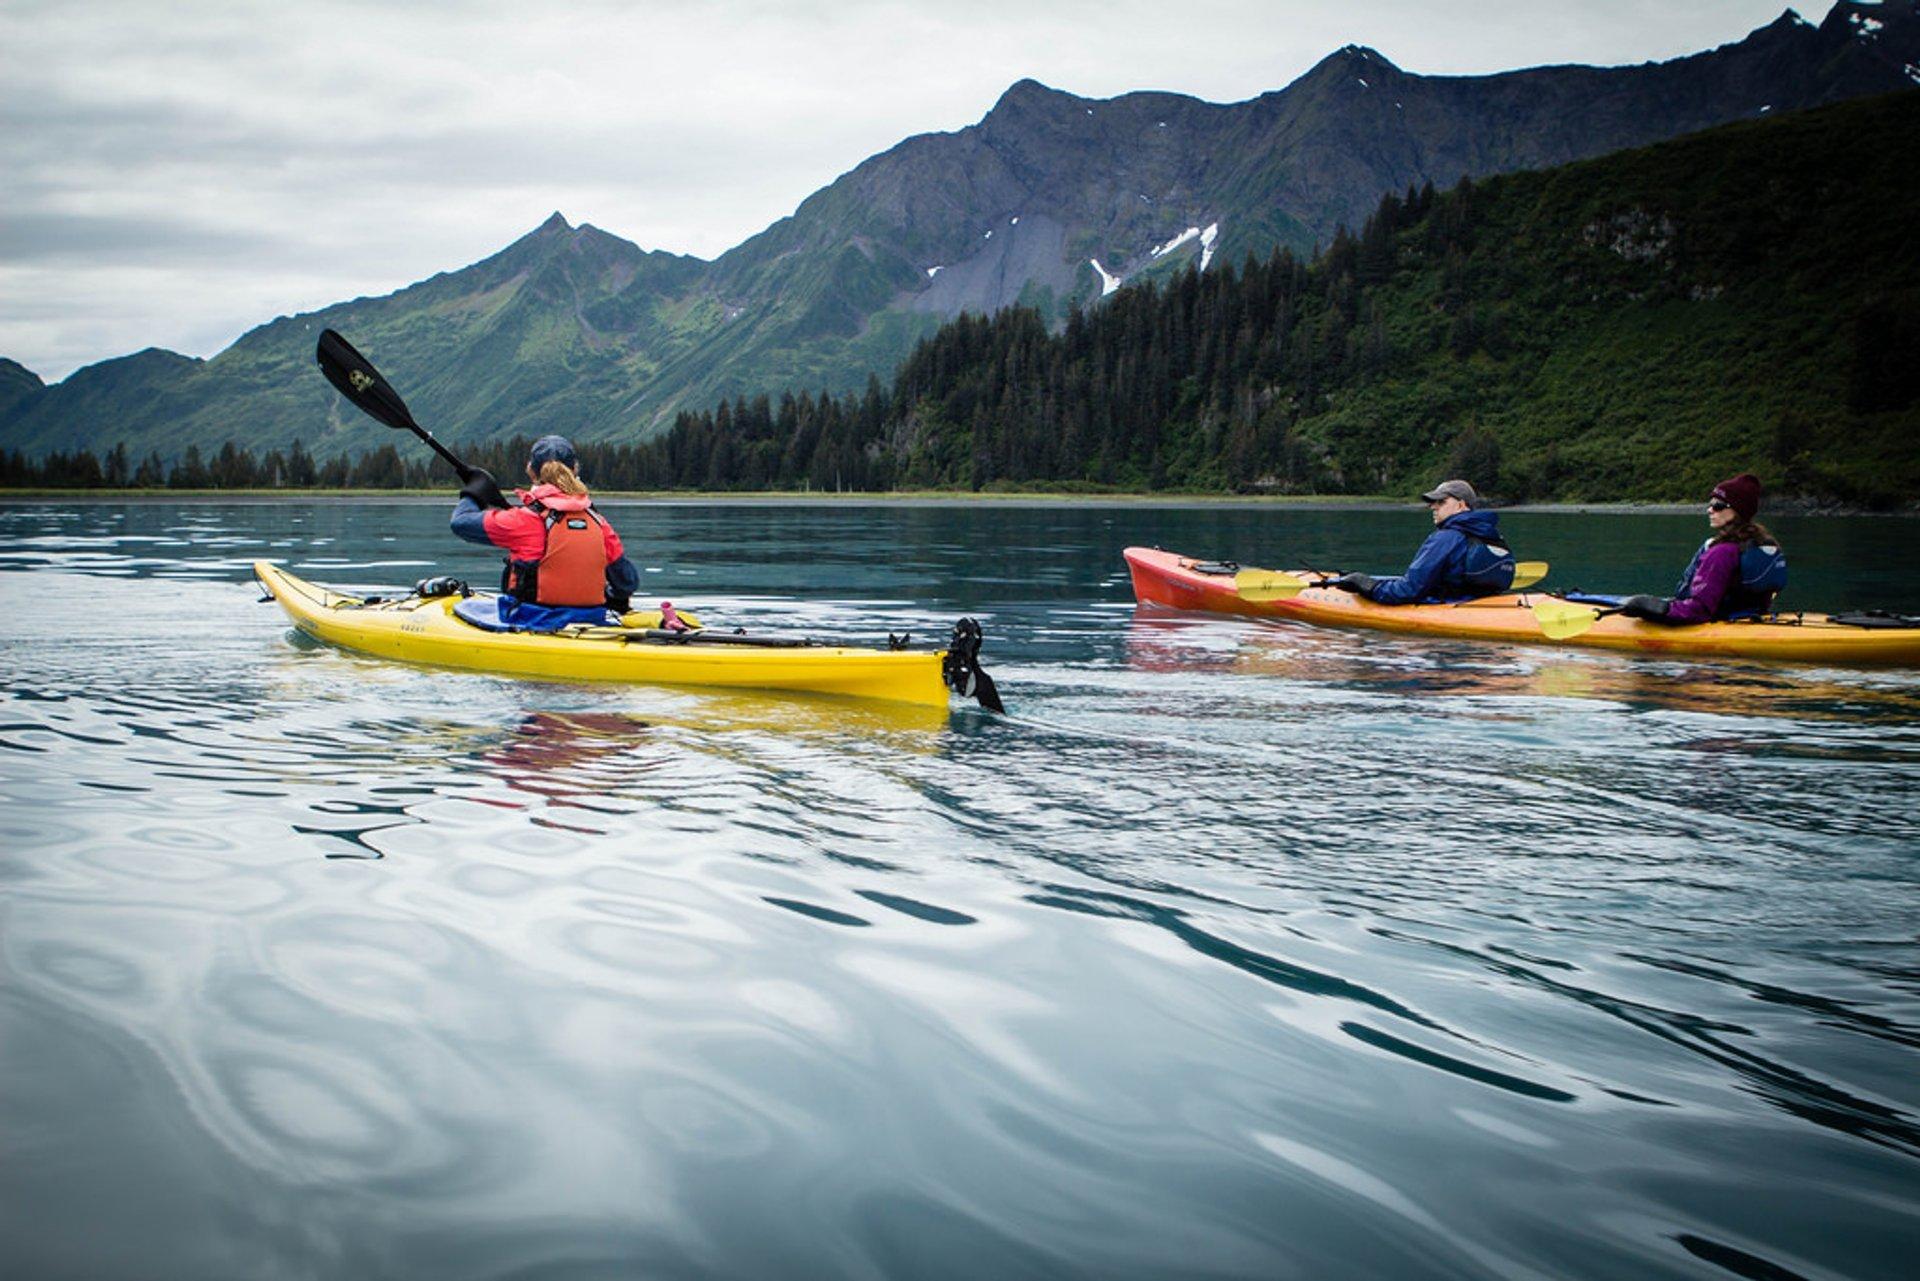 Aialik Bay, Kenai Fjords National Park, Seward, Alaska